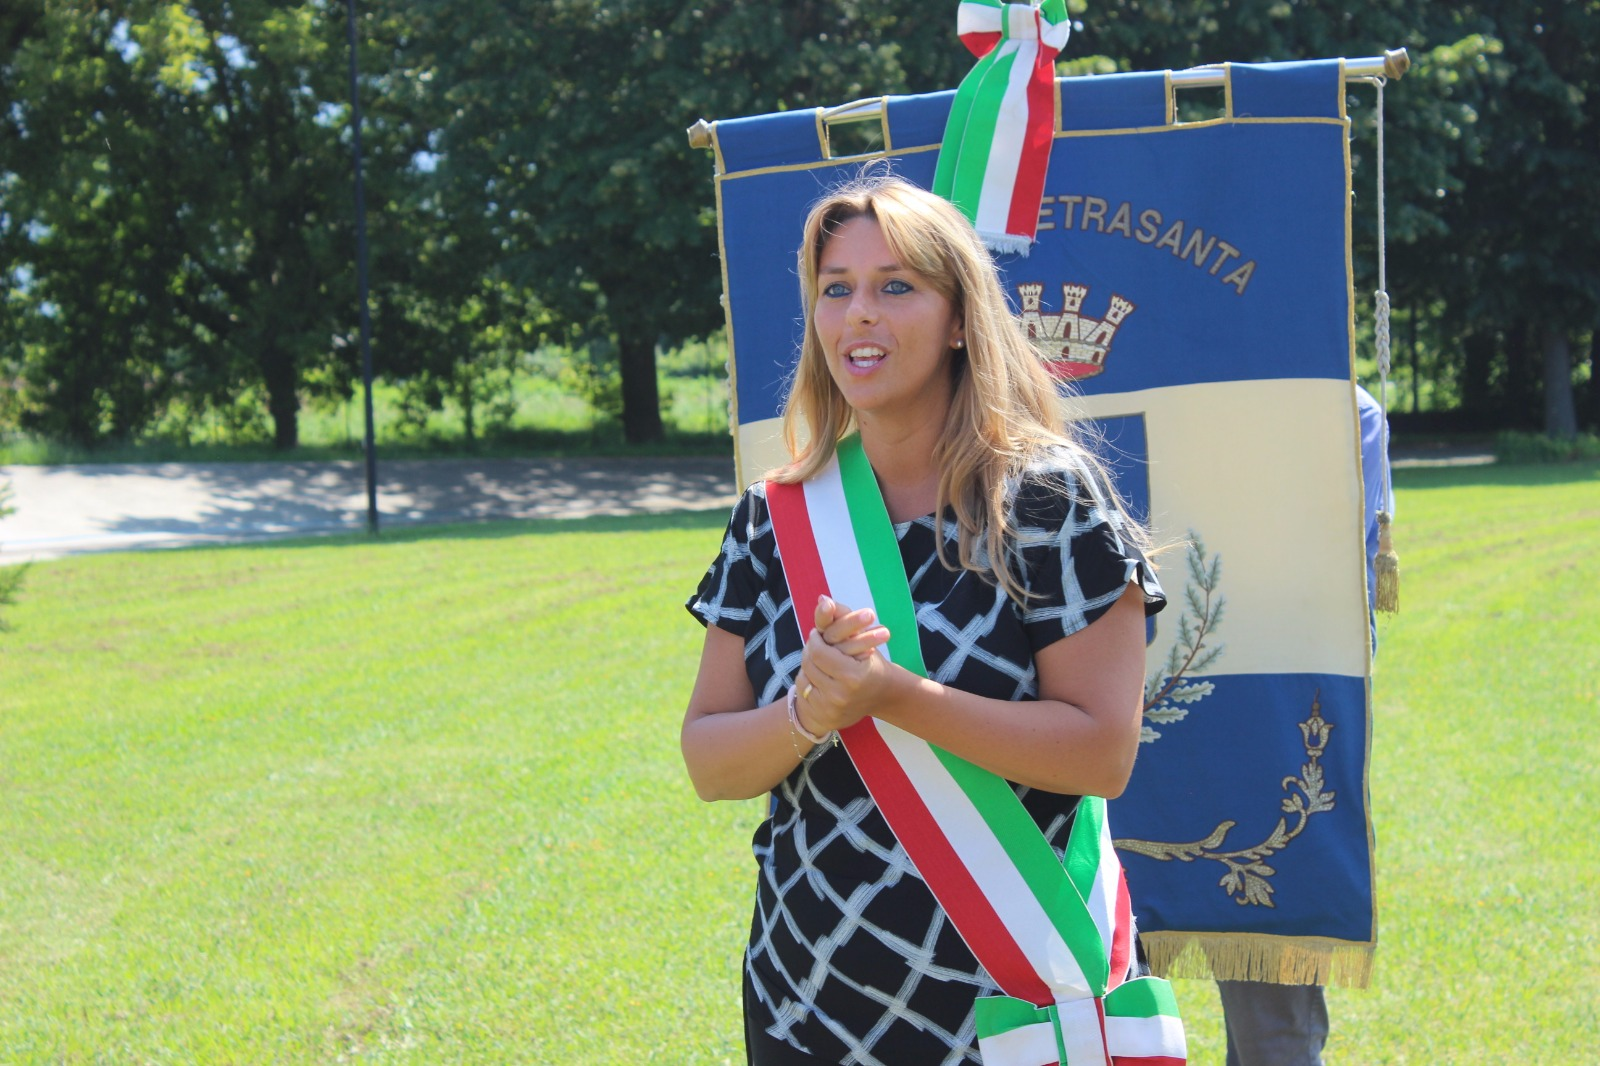 Centri estivi, Pietrasanta avvia indagine su interesse famiglie